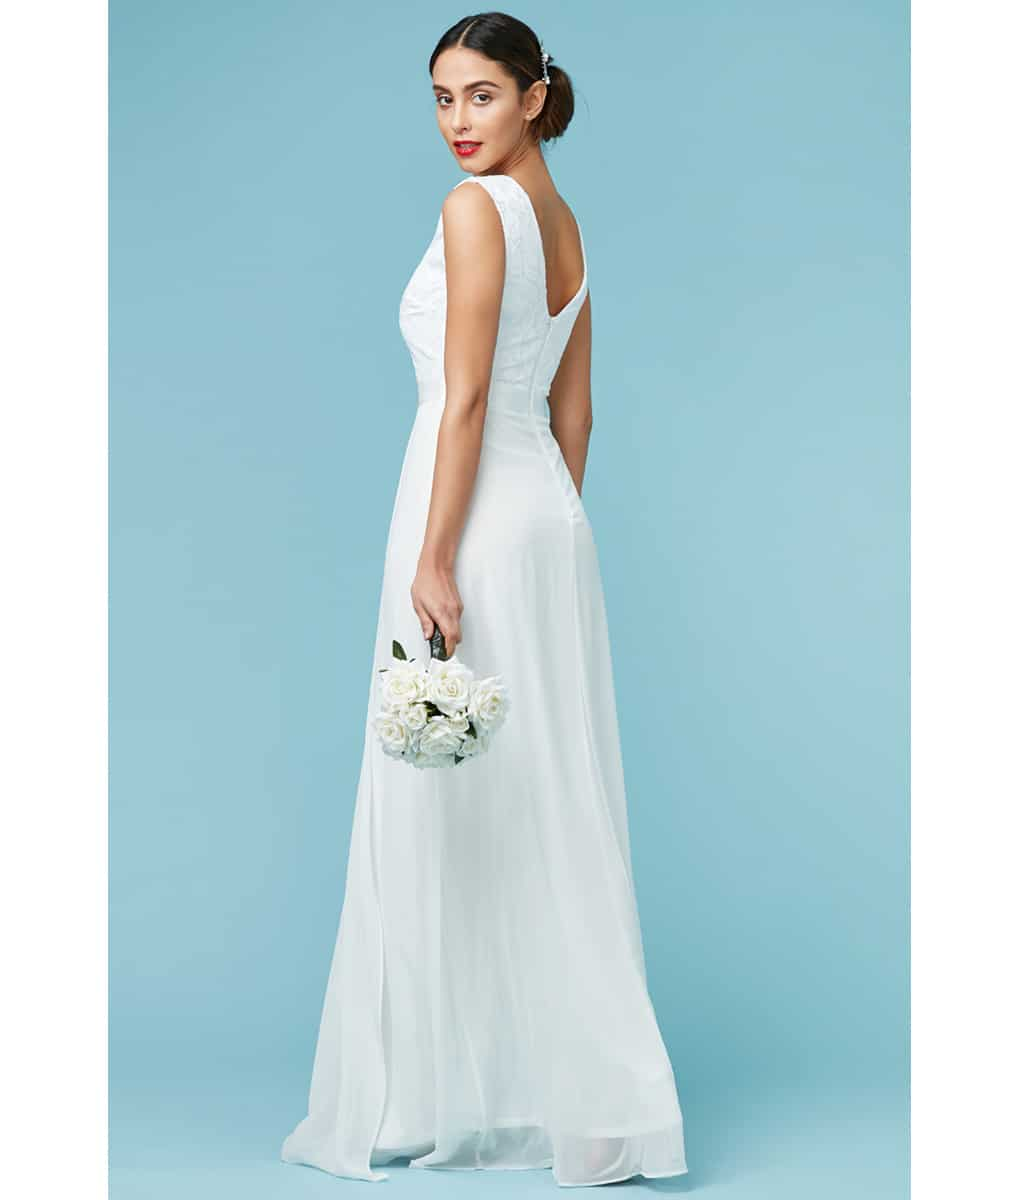 Alila-Bridal-Gown-City-Goddess-Back